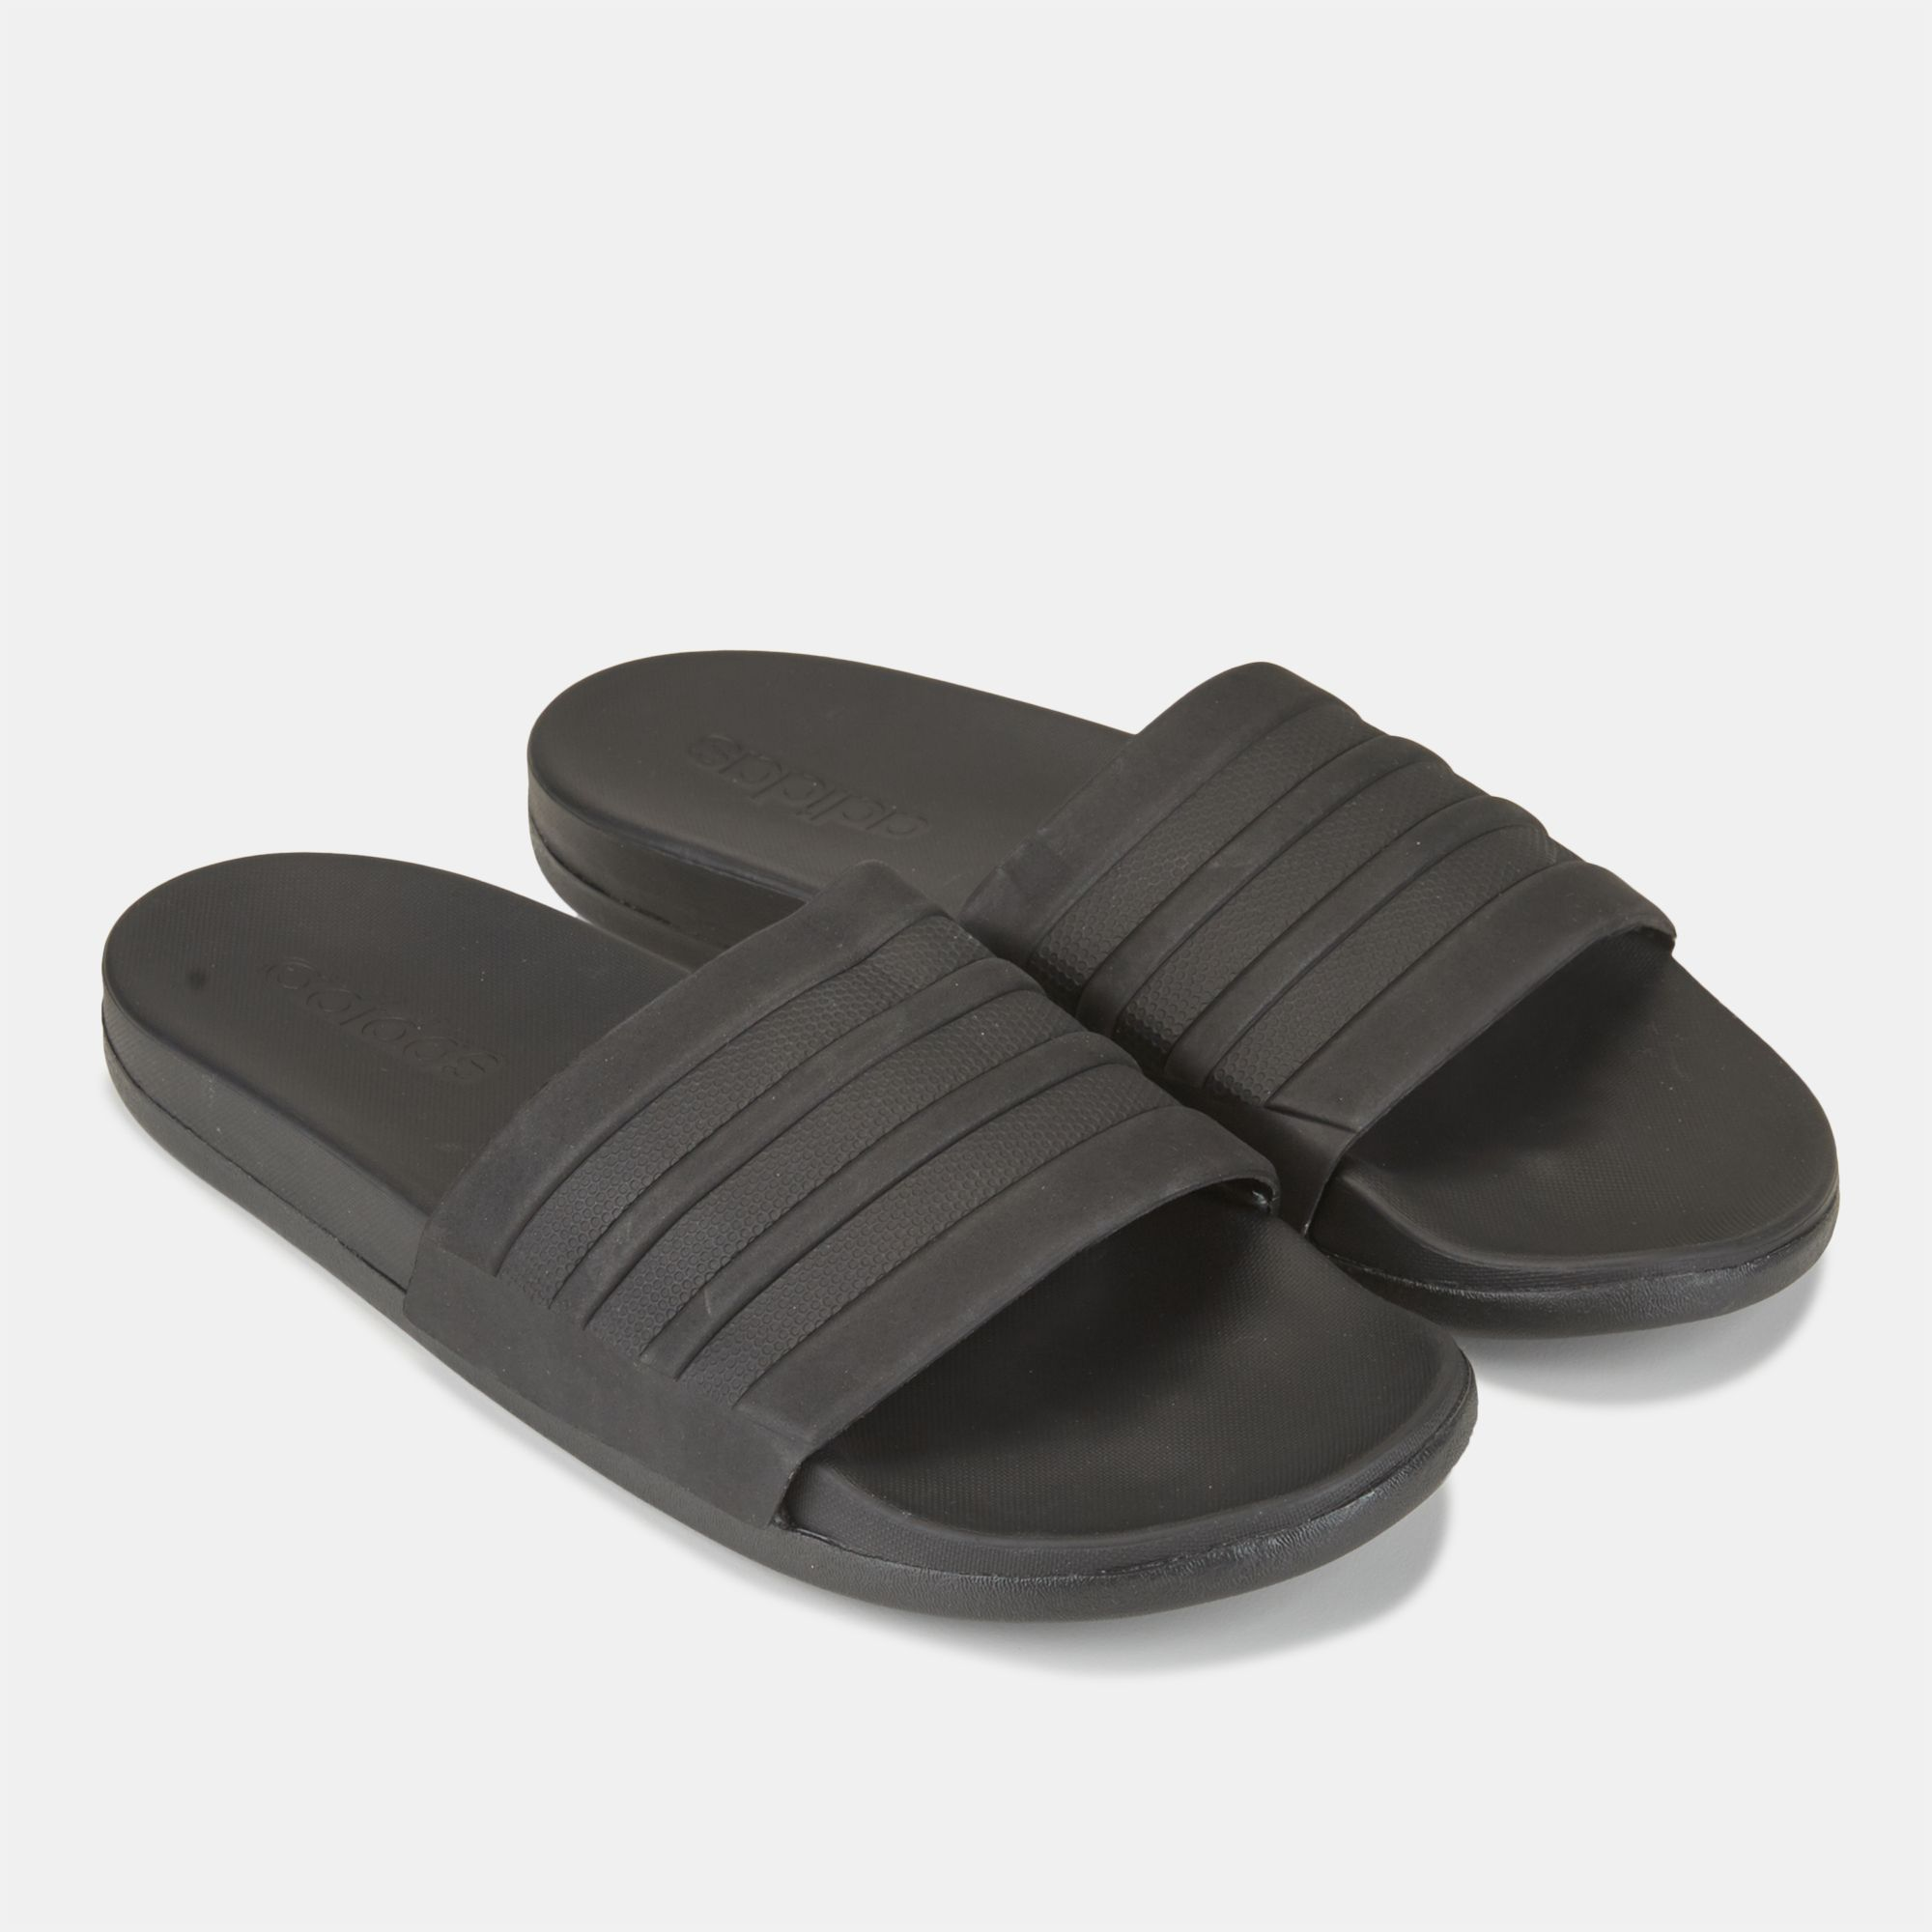 0b276794a099 adidas Adilette Cloudfoam Plus Mono Slides